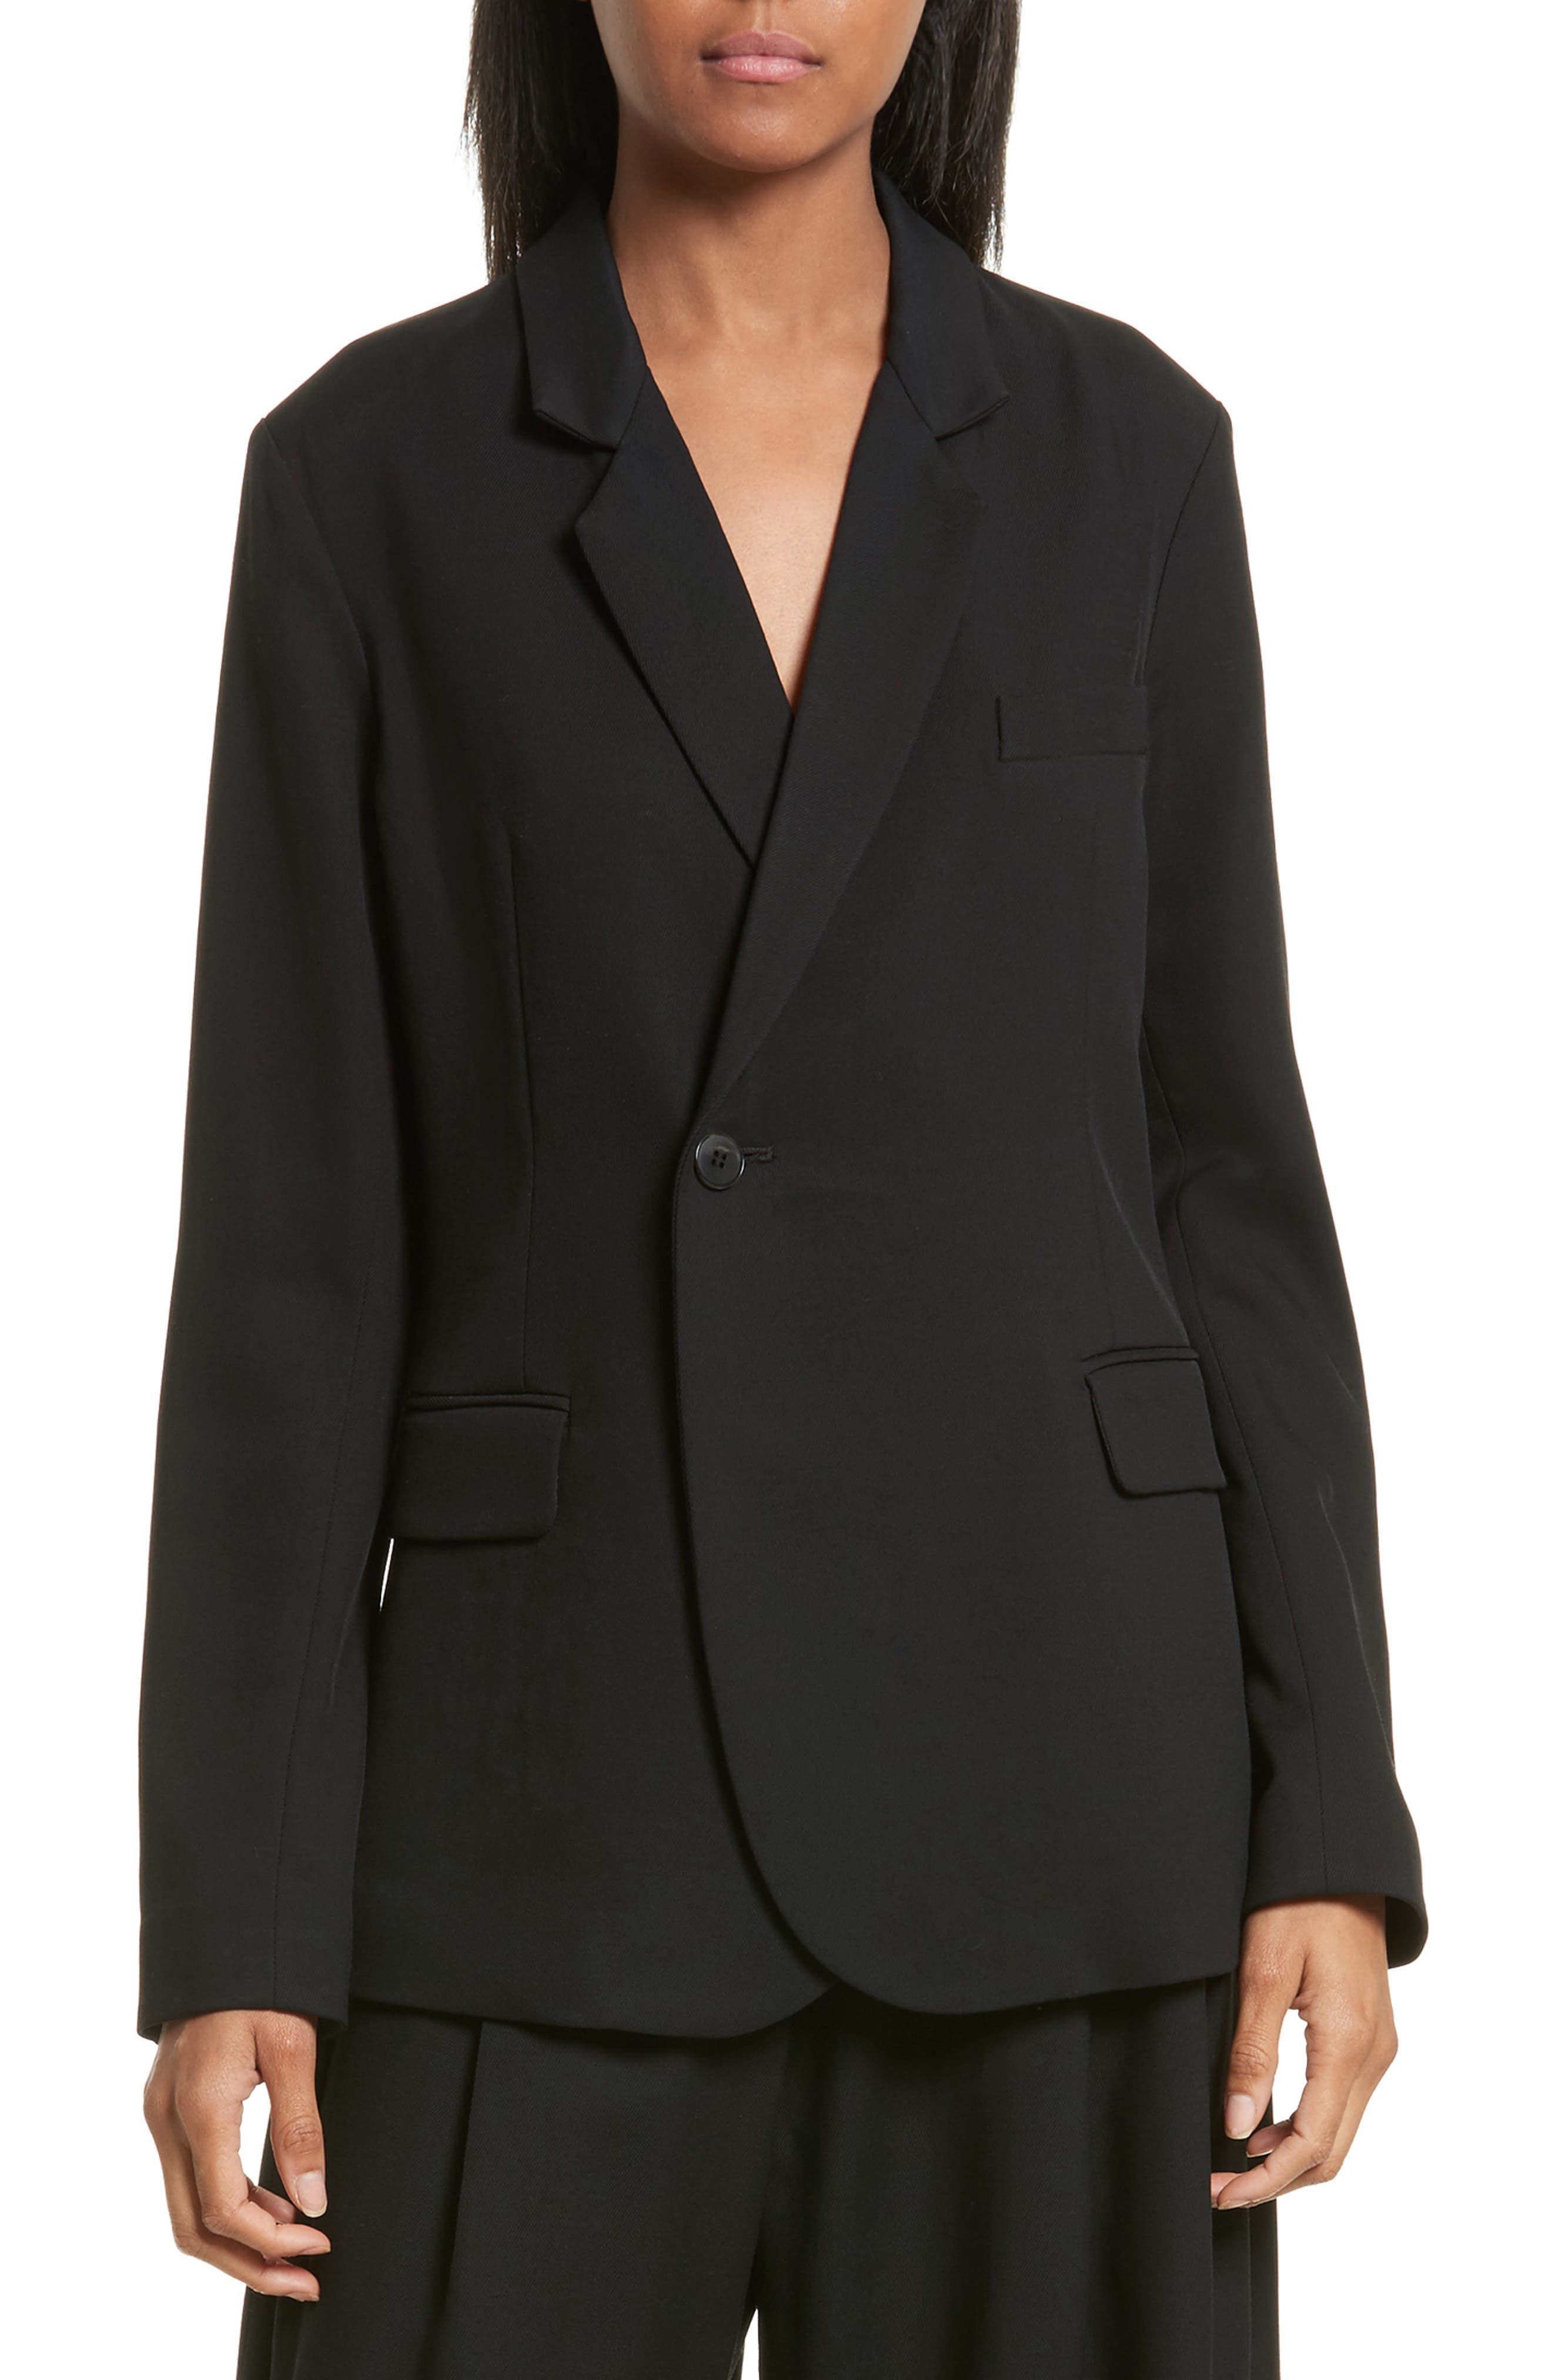 Classon Jacket,                             Main thumbnail 1, color,                             Black